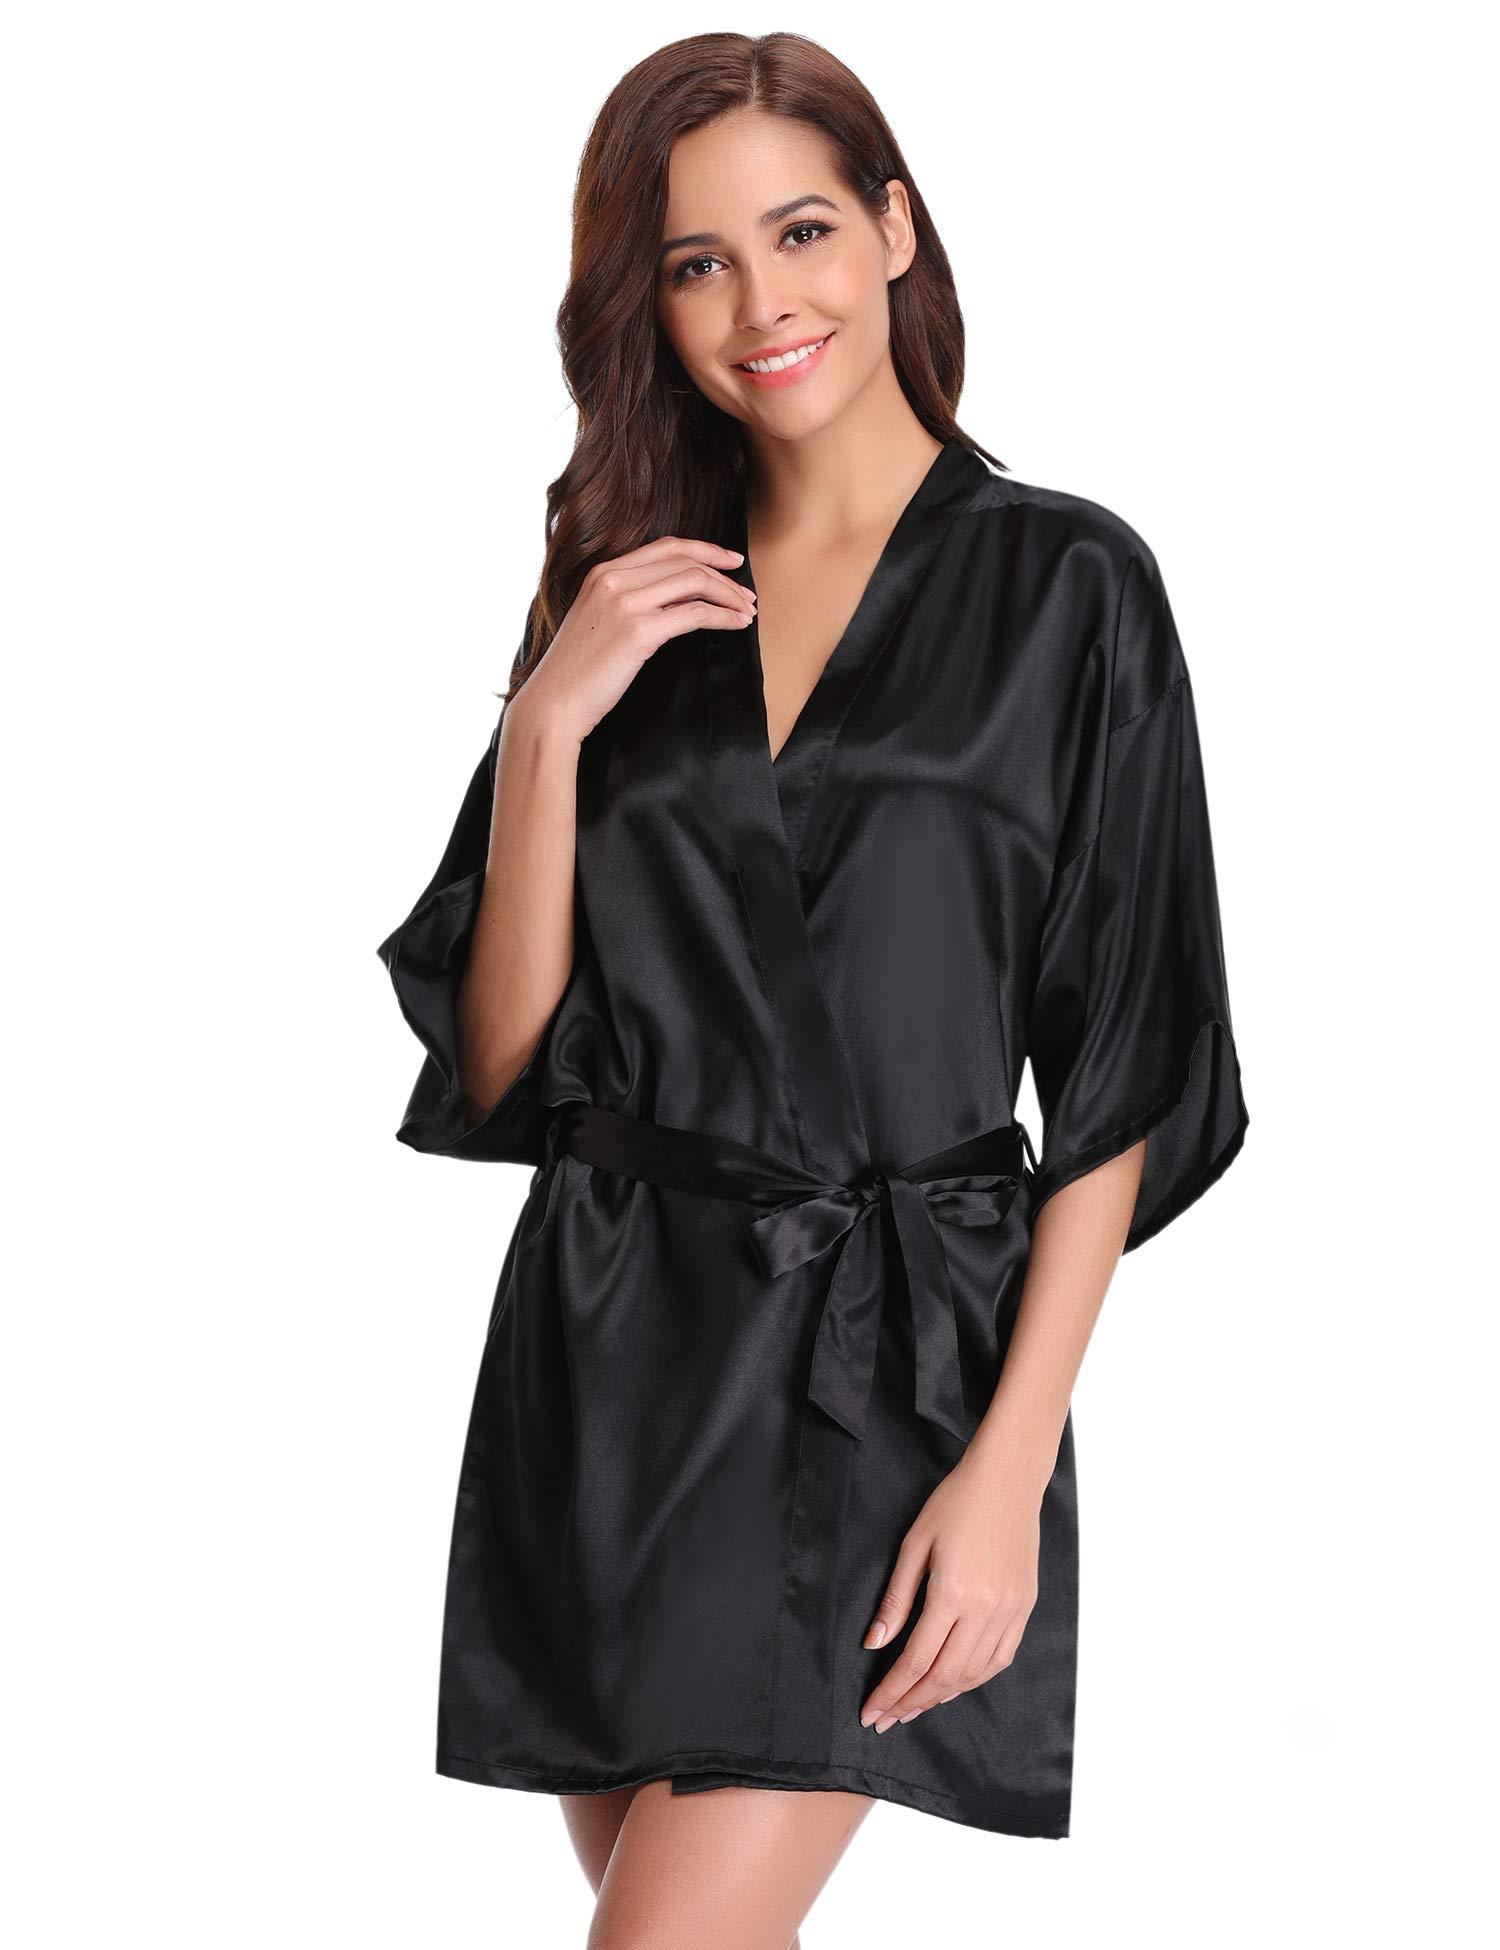 Aibrou Kimono Mujer Batas Cortos Lenceria de Aspecto Brillante product image